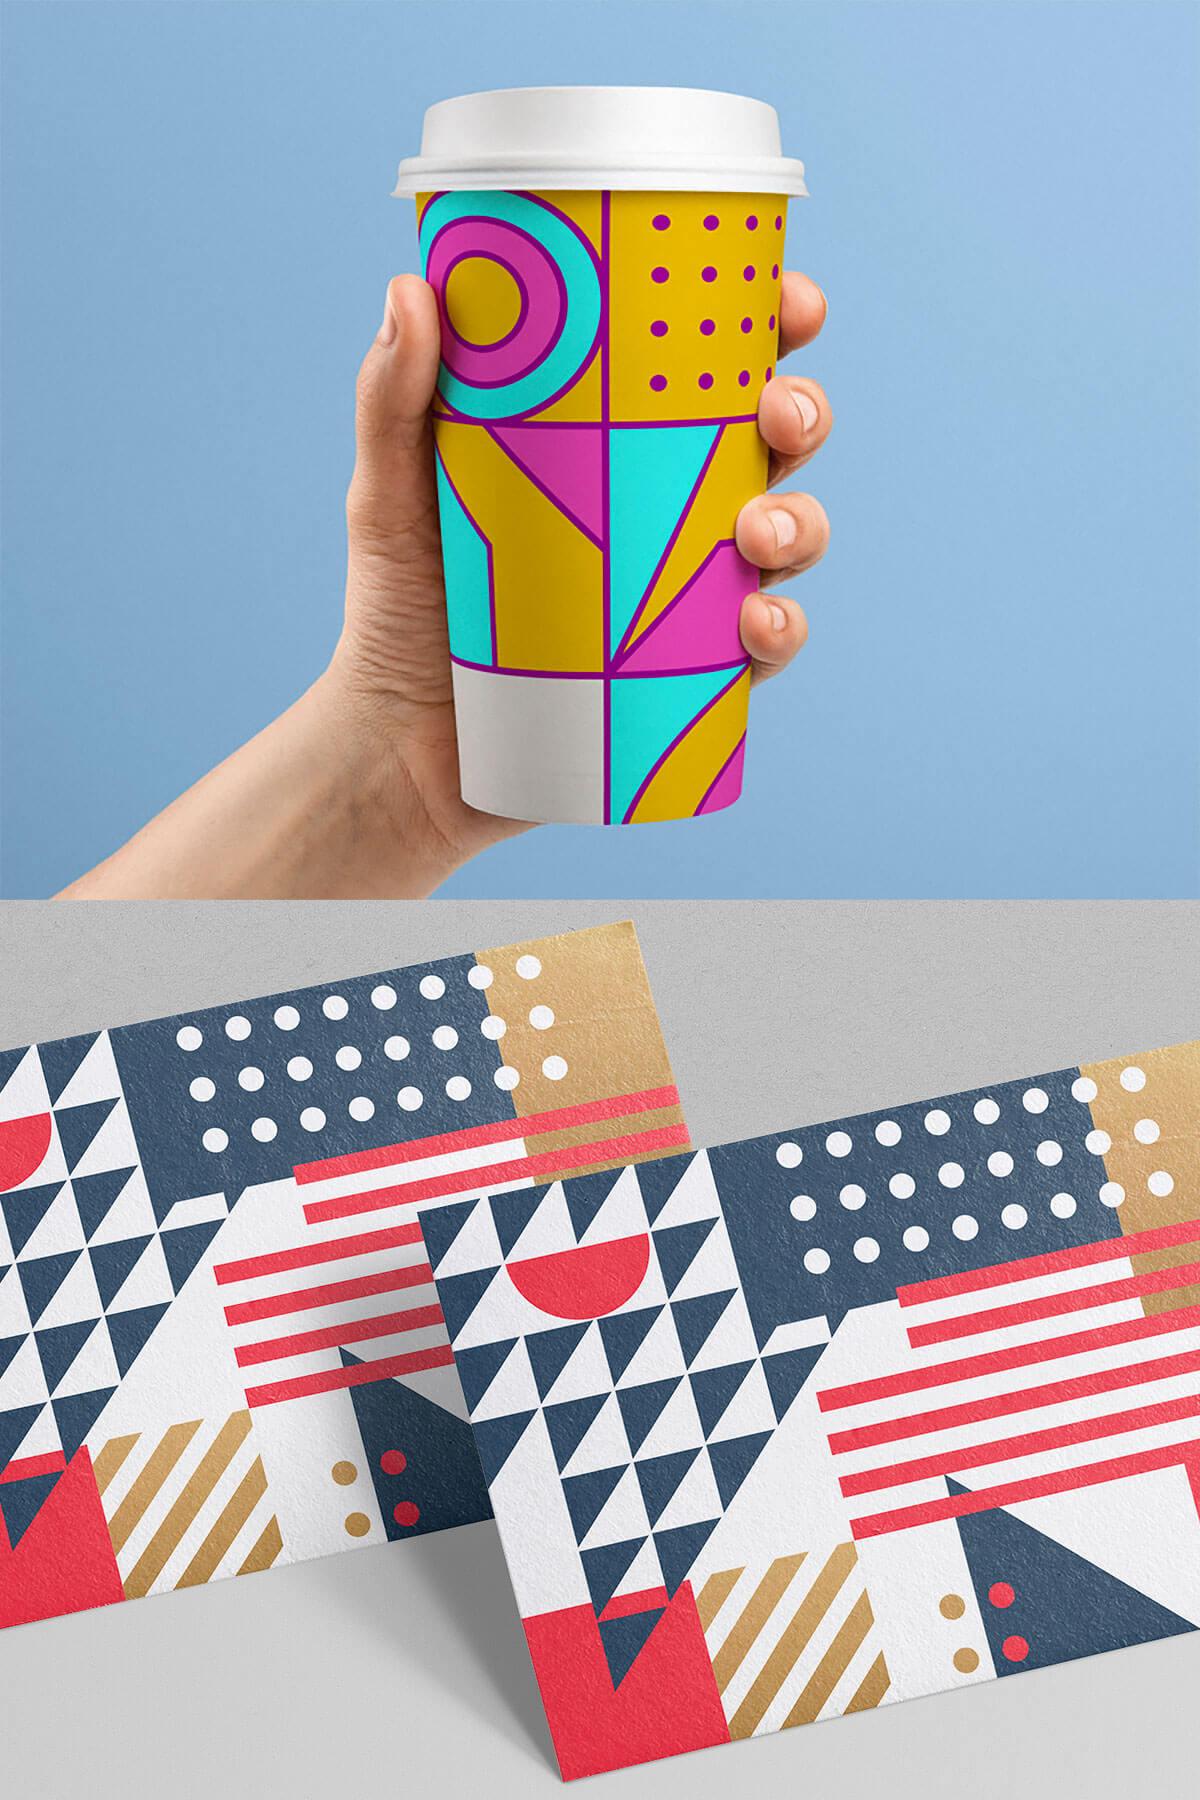 American Pattern by Type08 (Alen Pavlovic)